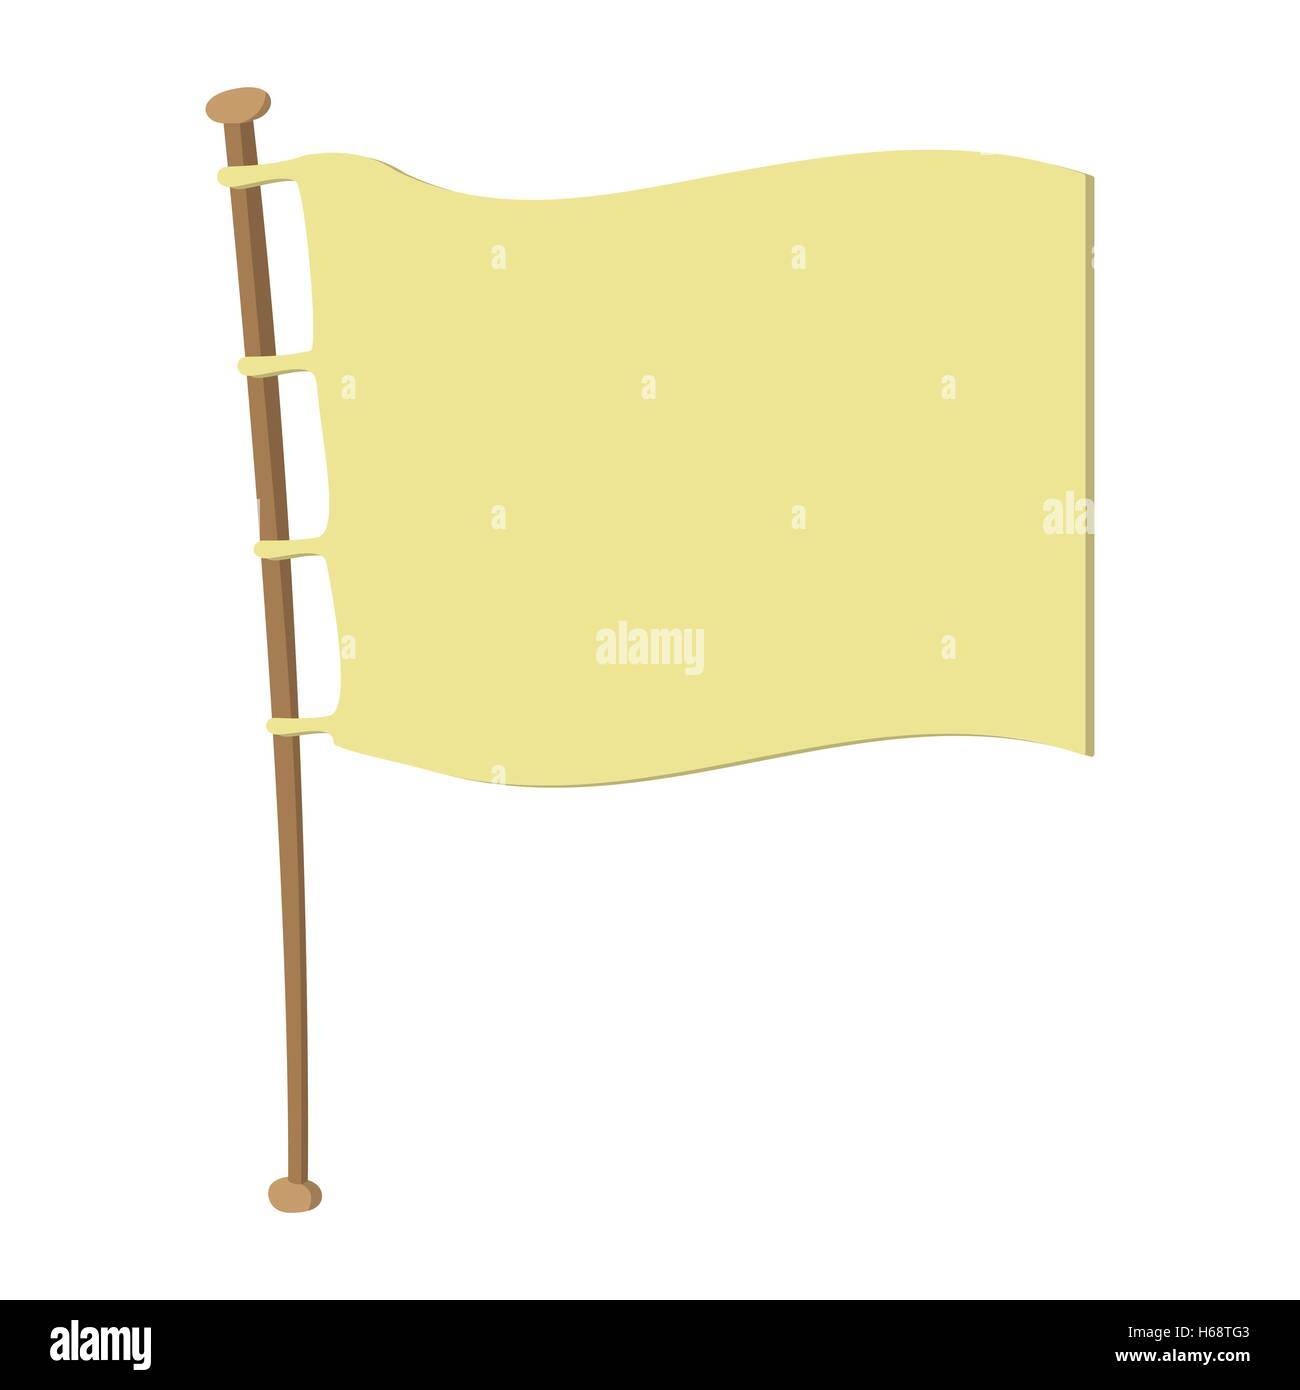 White flag on wooden flagpole - Stock Vector